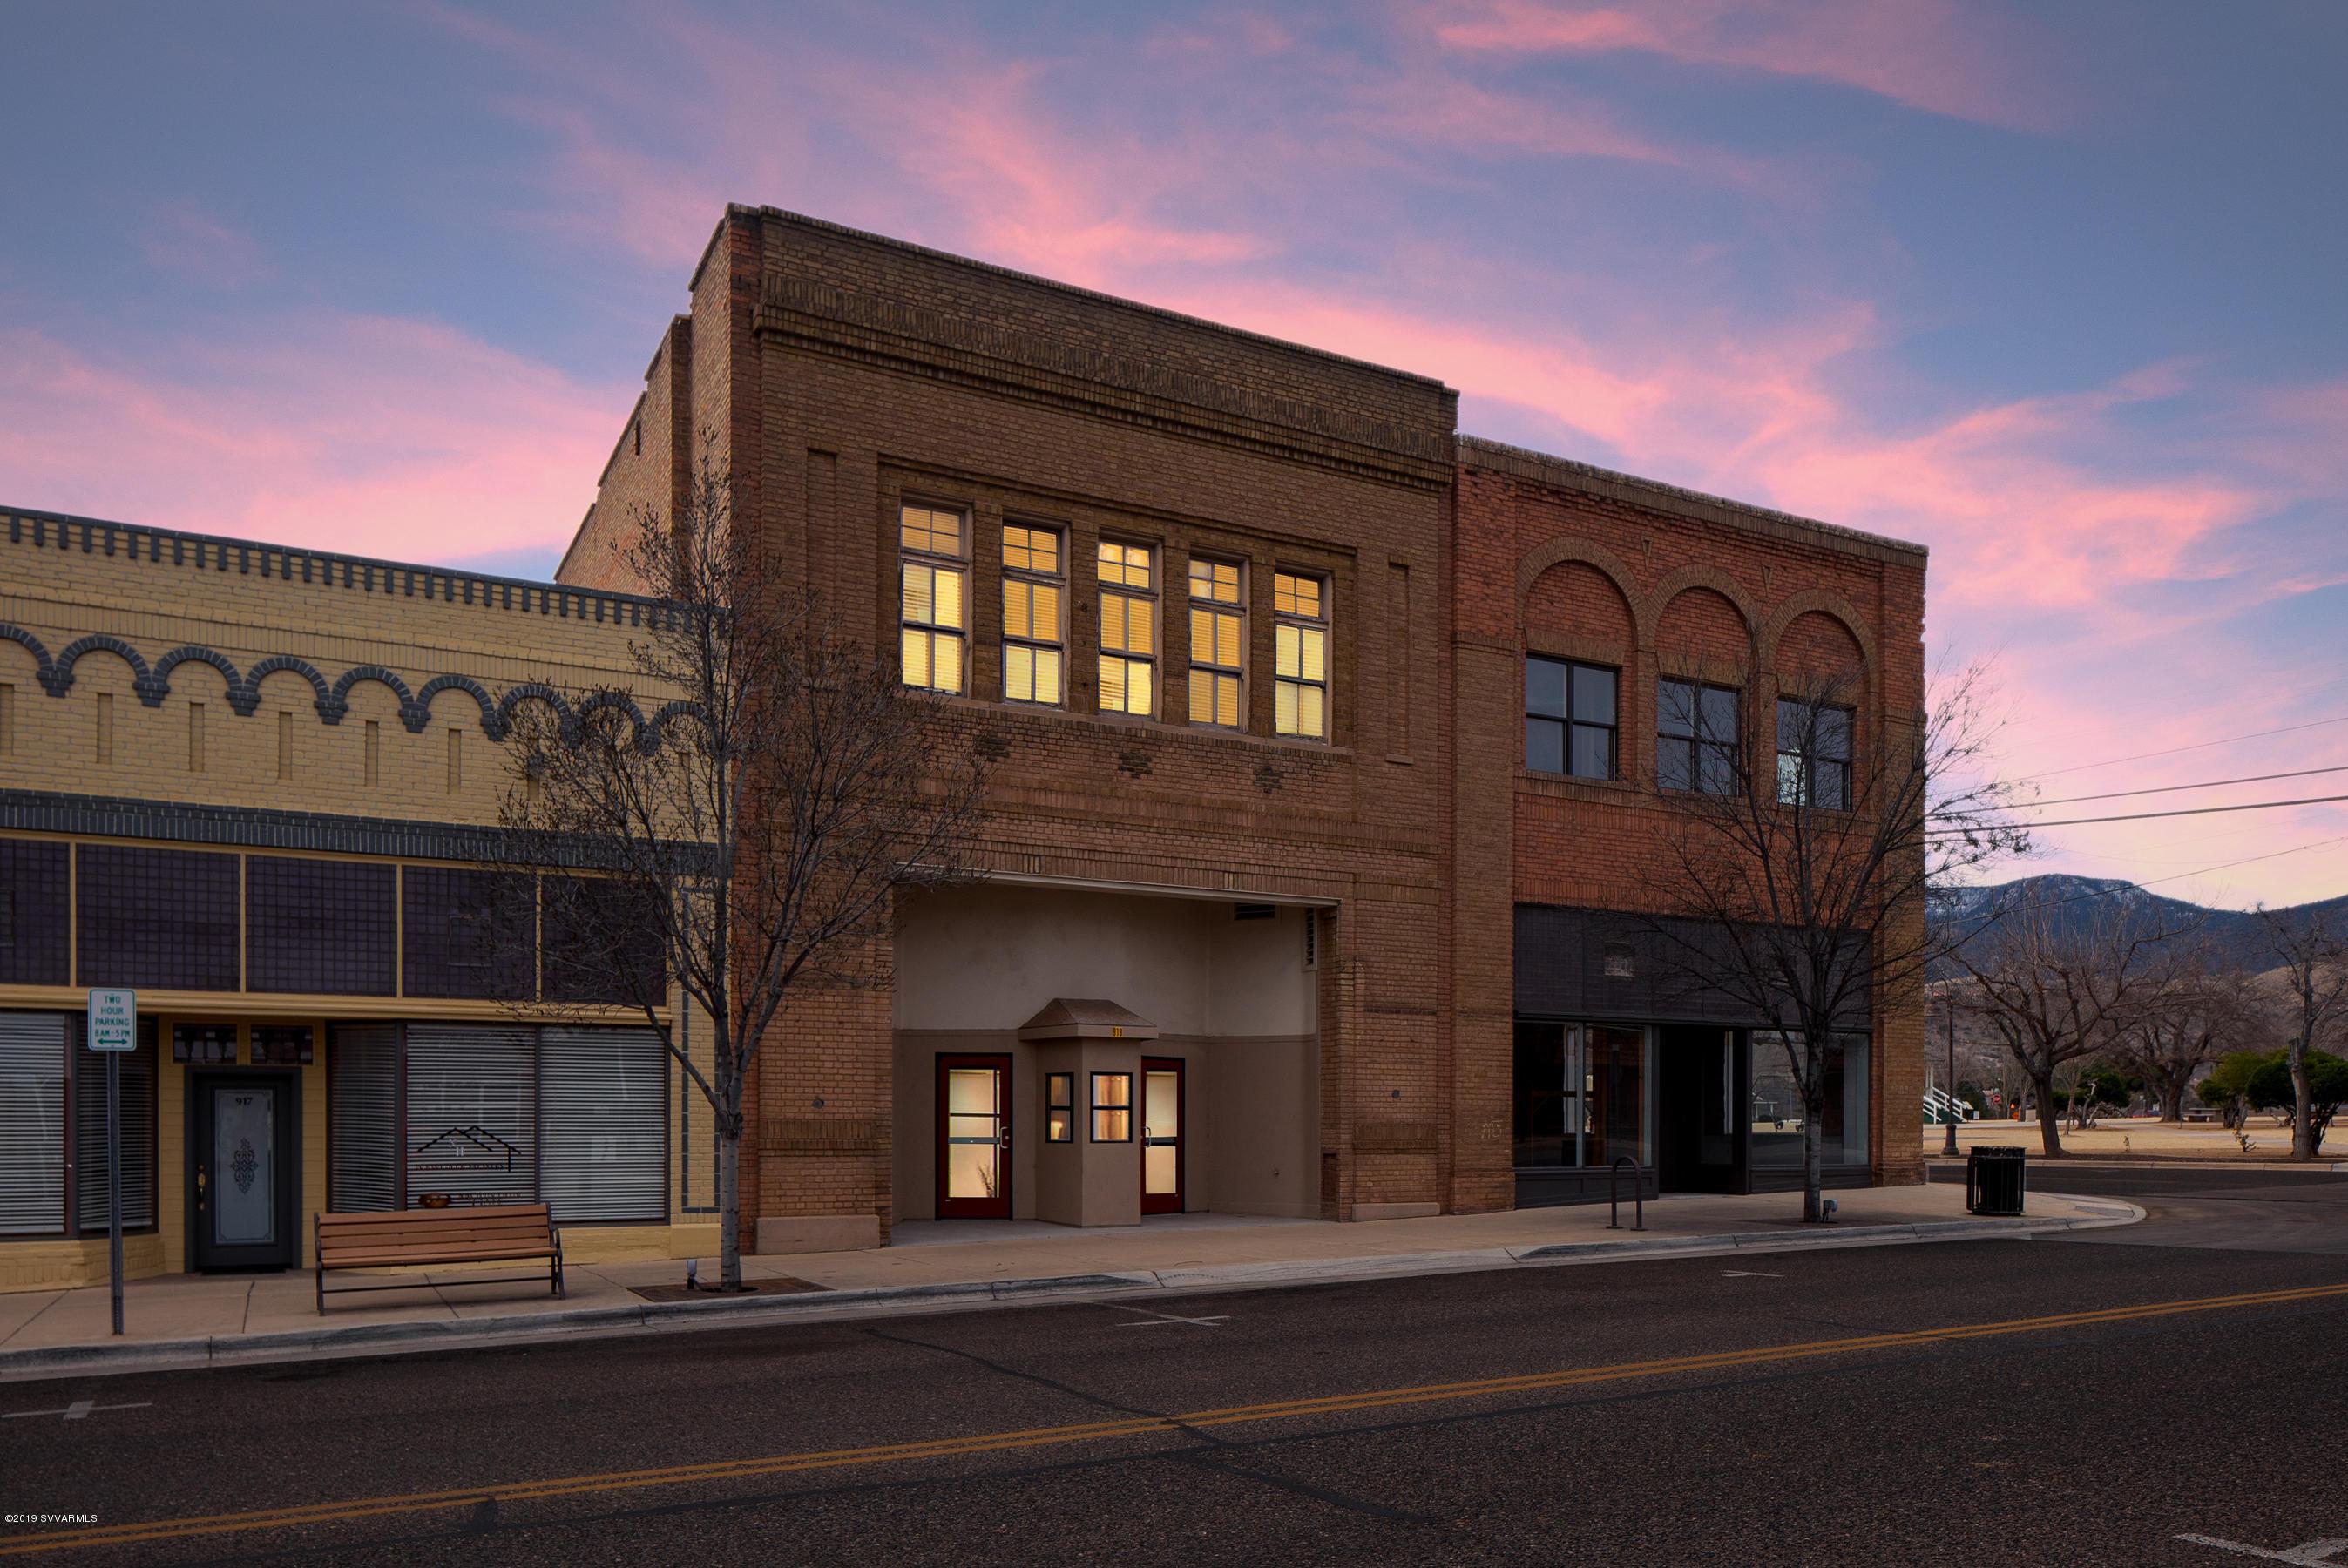 919 Main St Clarkdale, AZ 86324